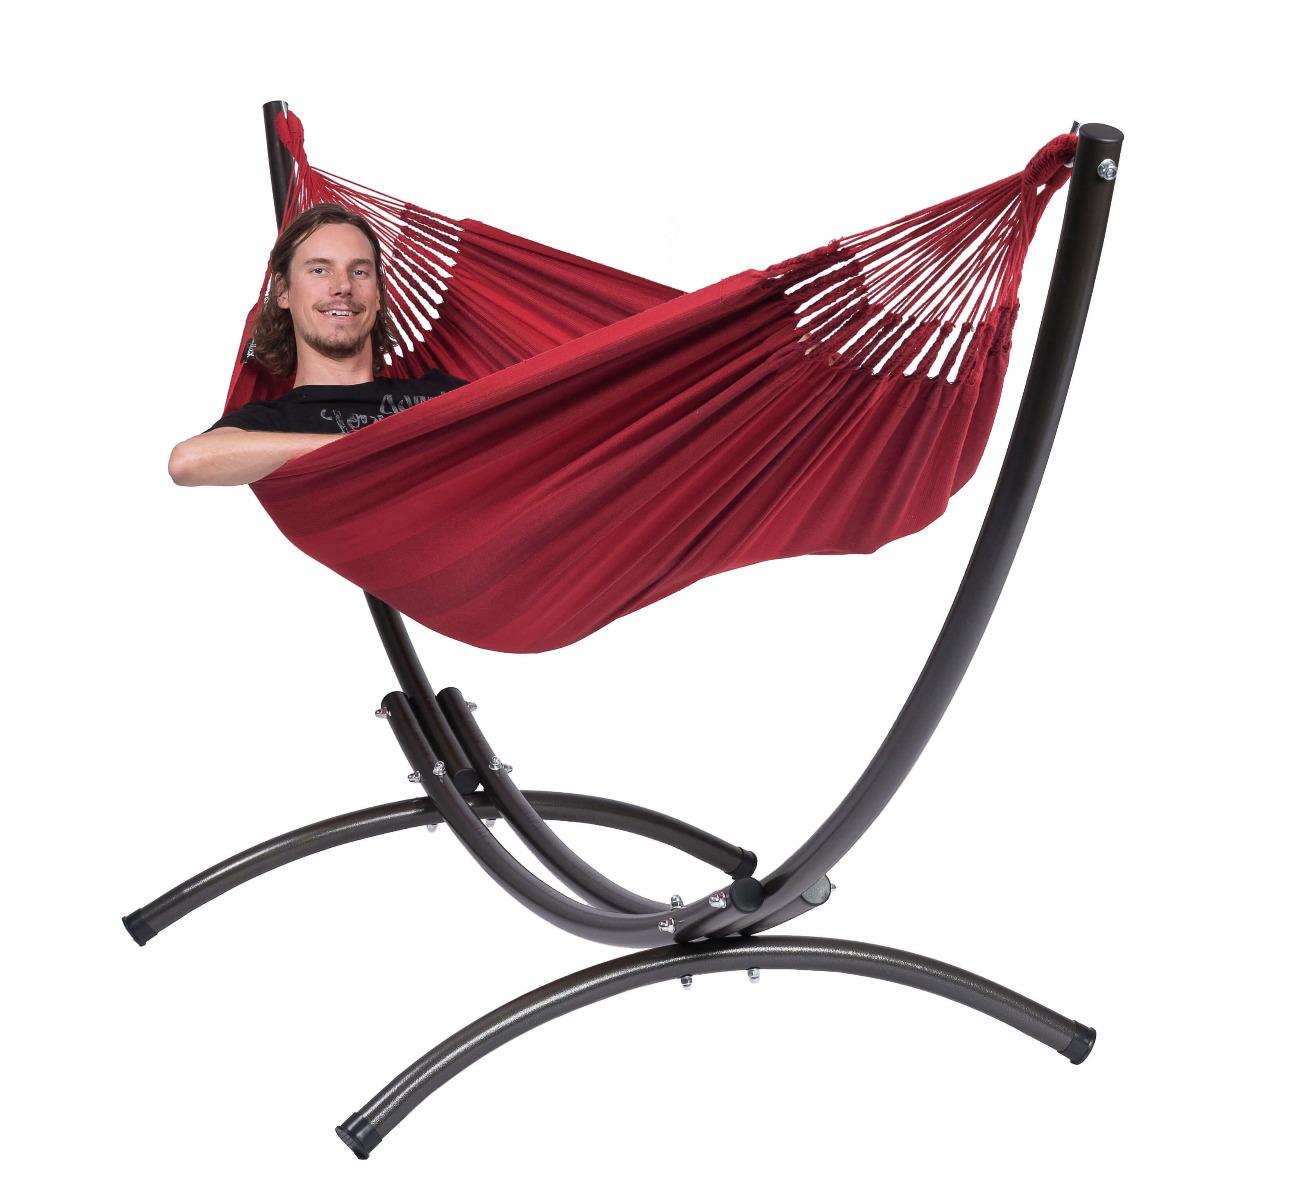 Hangmat 'Dream' Red - Tropilex �